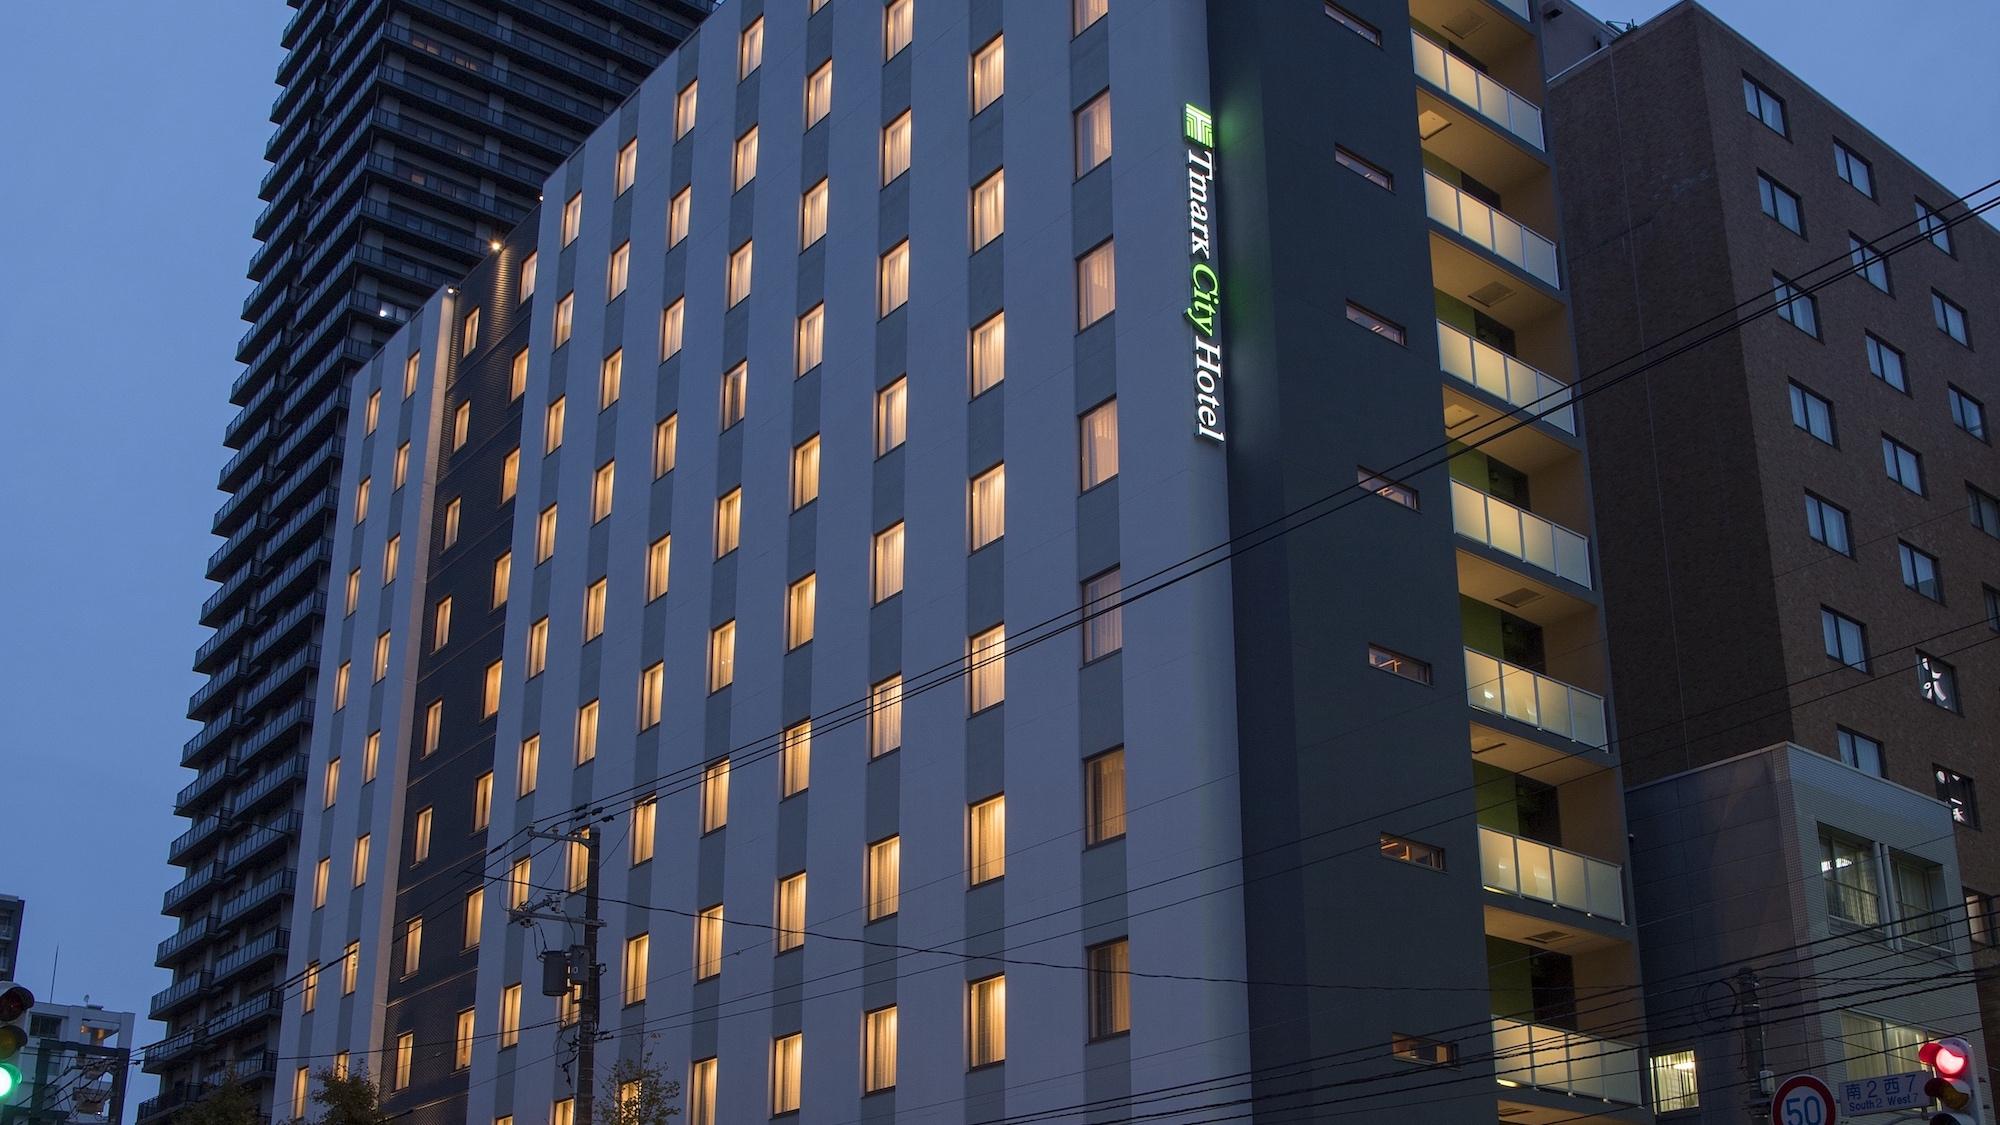 Tマークシティホテル札幌大通 外観写真